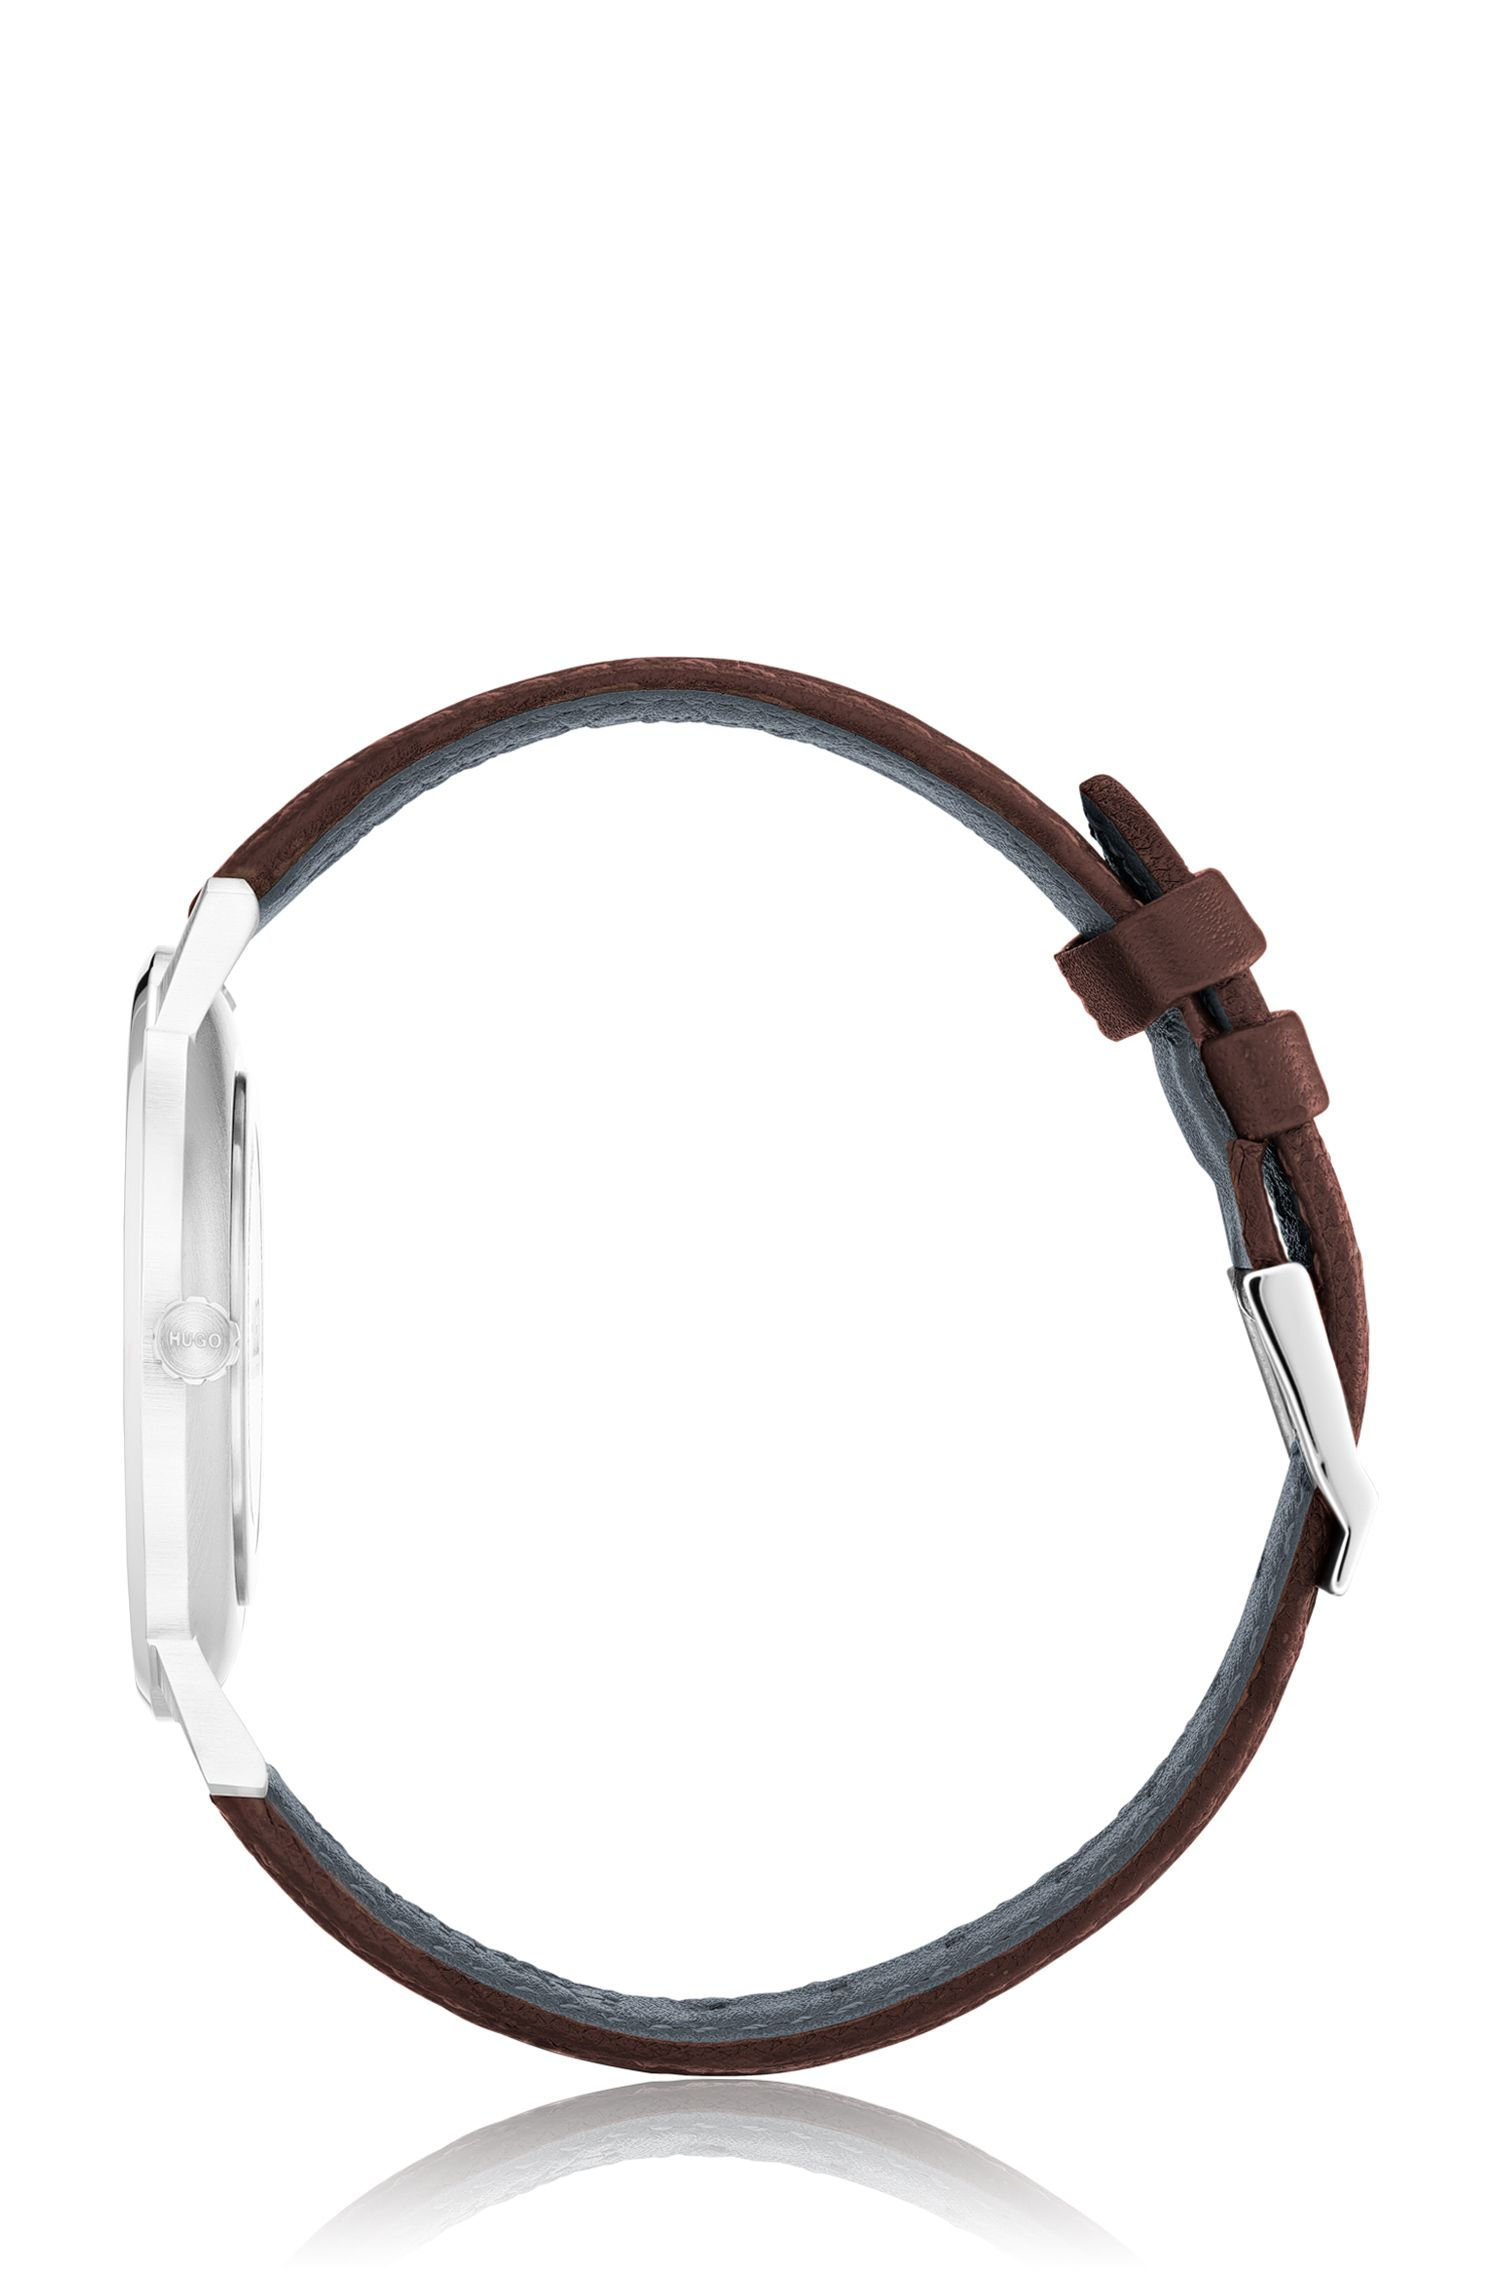 Montre mixte en acier inoxydable, avec bracelet en cuir marron, Marron